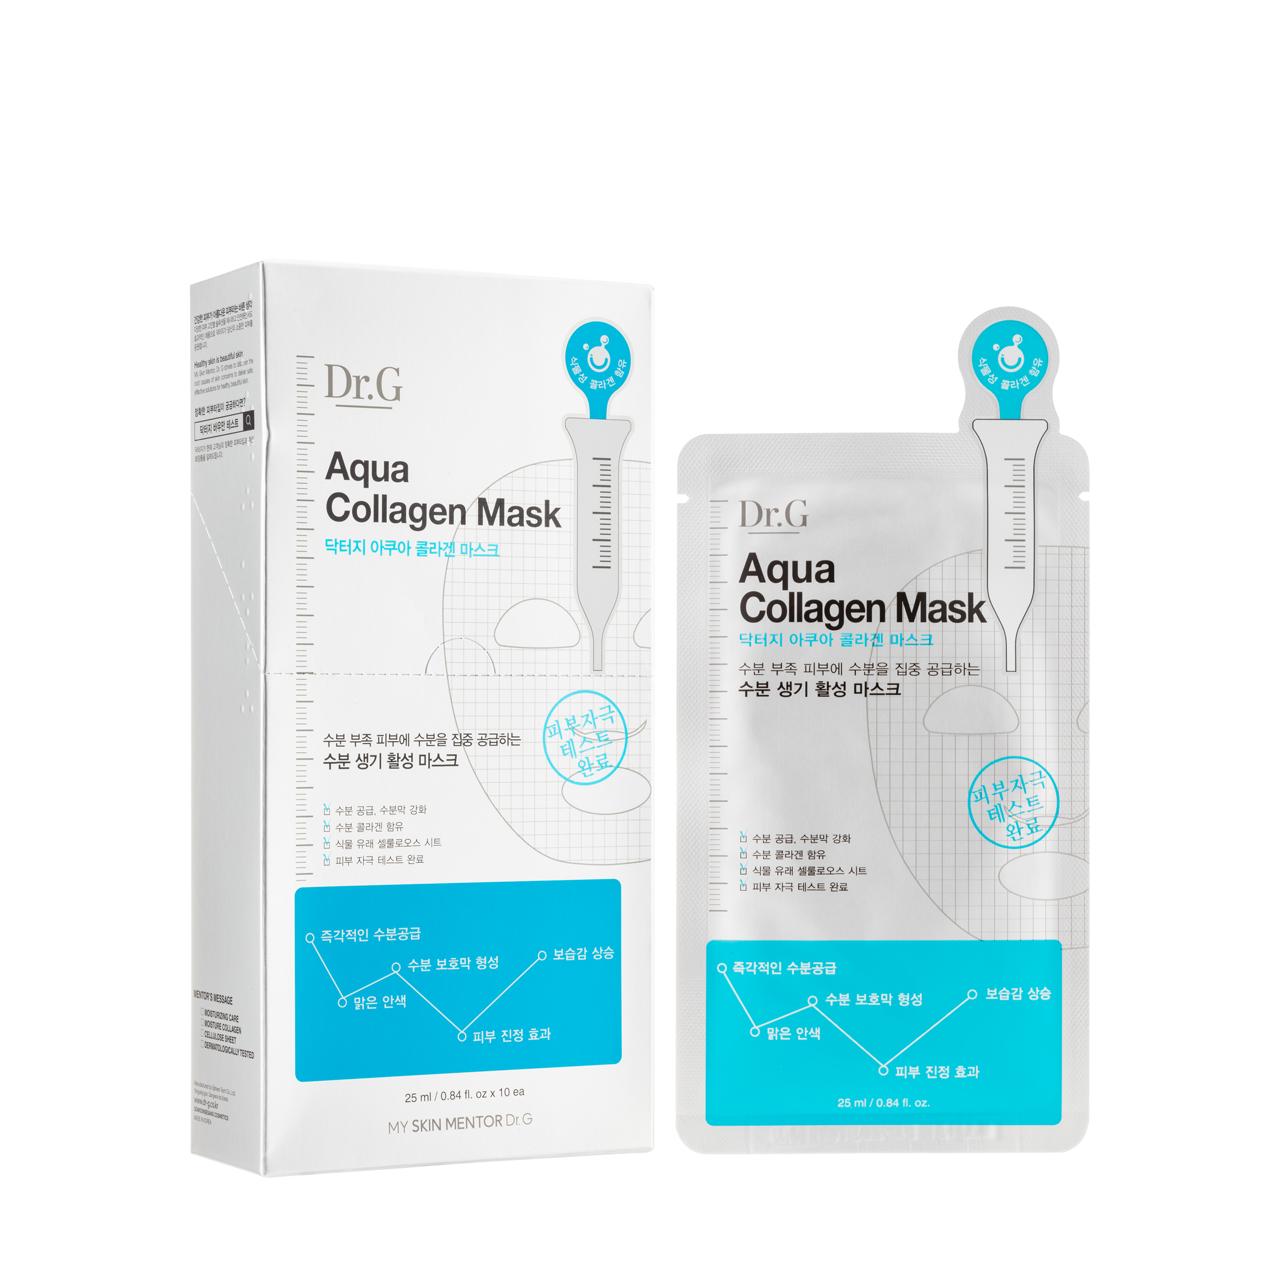 Dr. G Aqua Collagen Mask